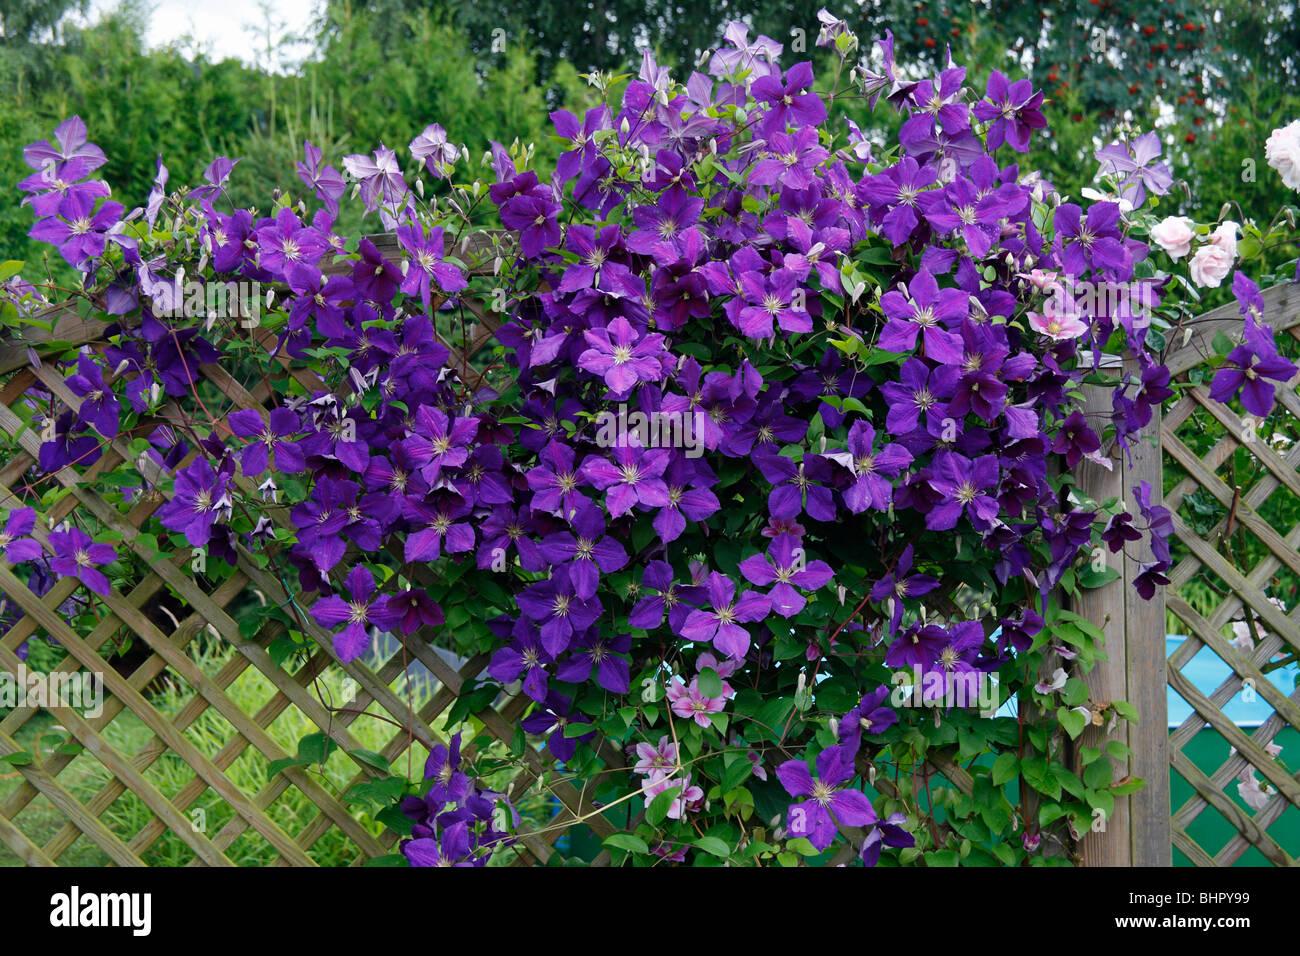 Flowering Clematis (x Jackmanni), Growing On Trellis In Garden, Germany    Stock